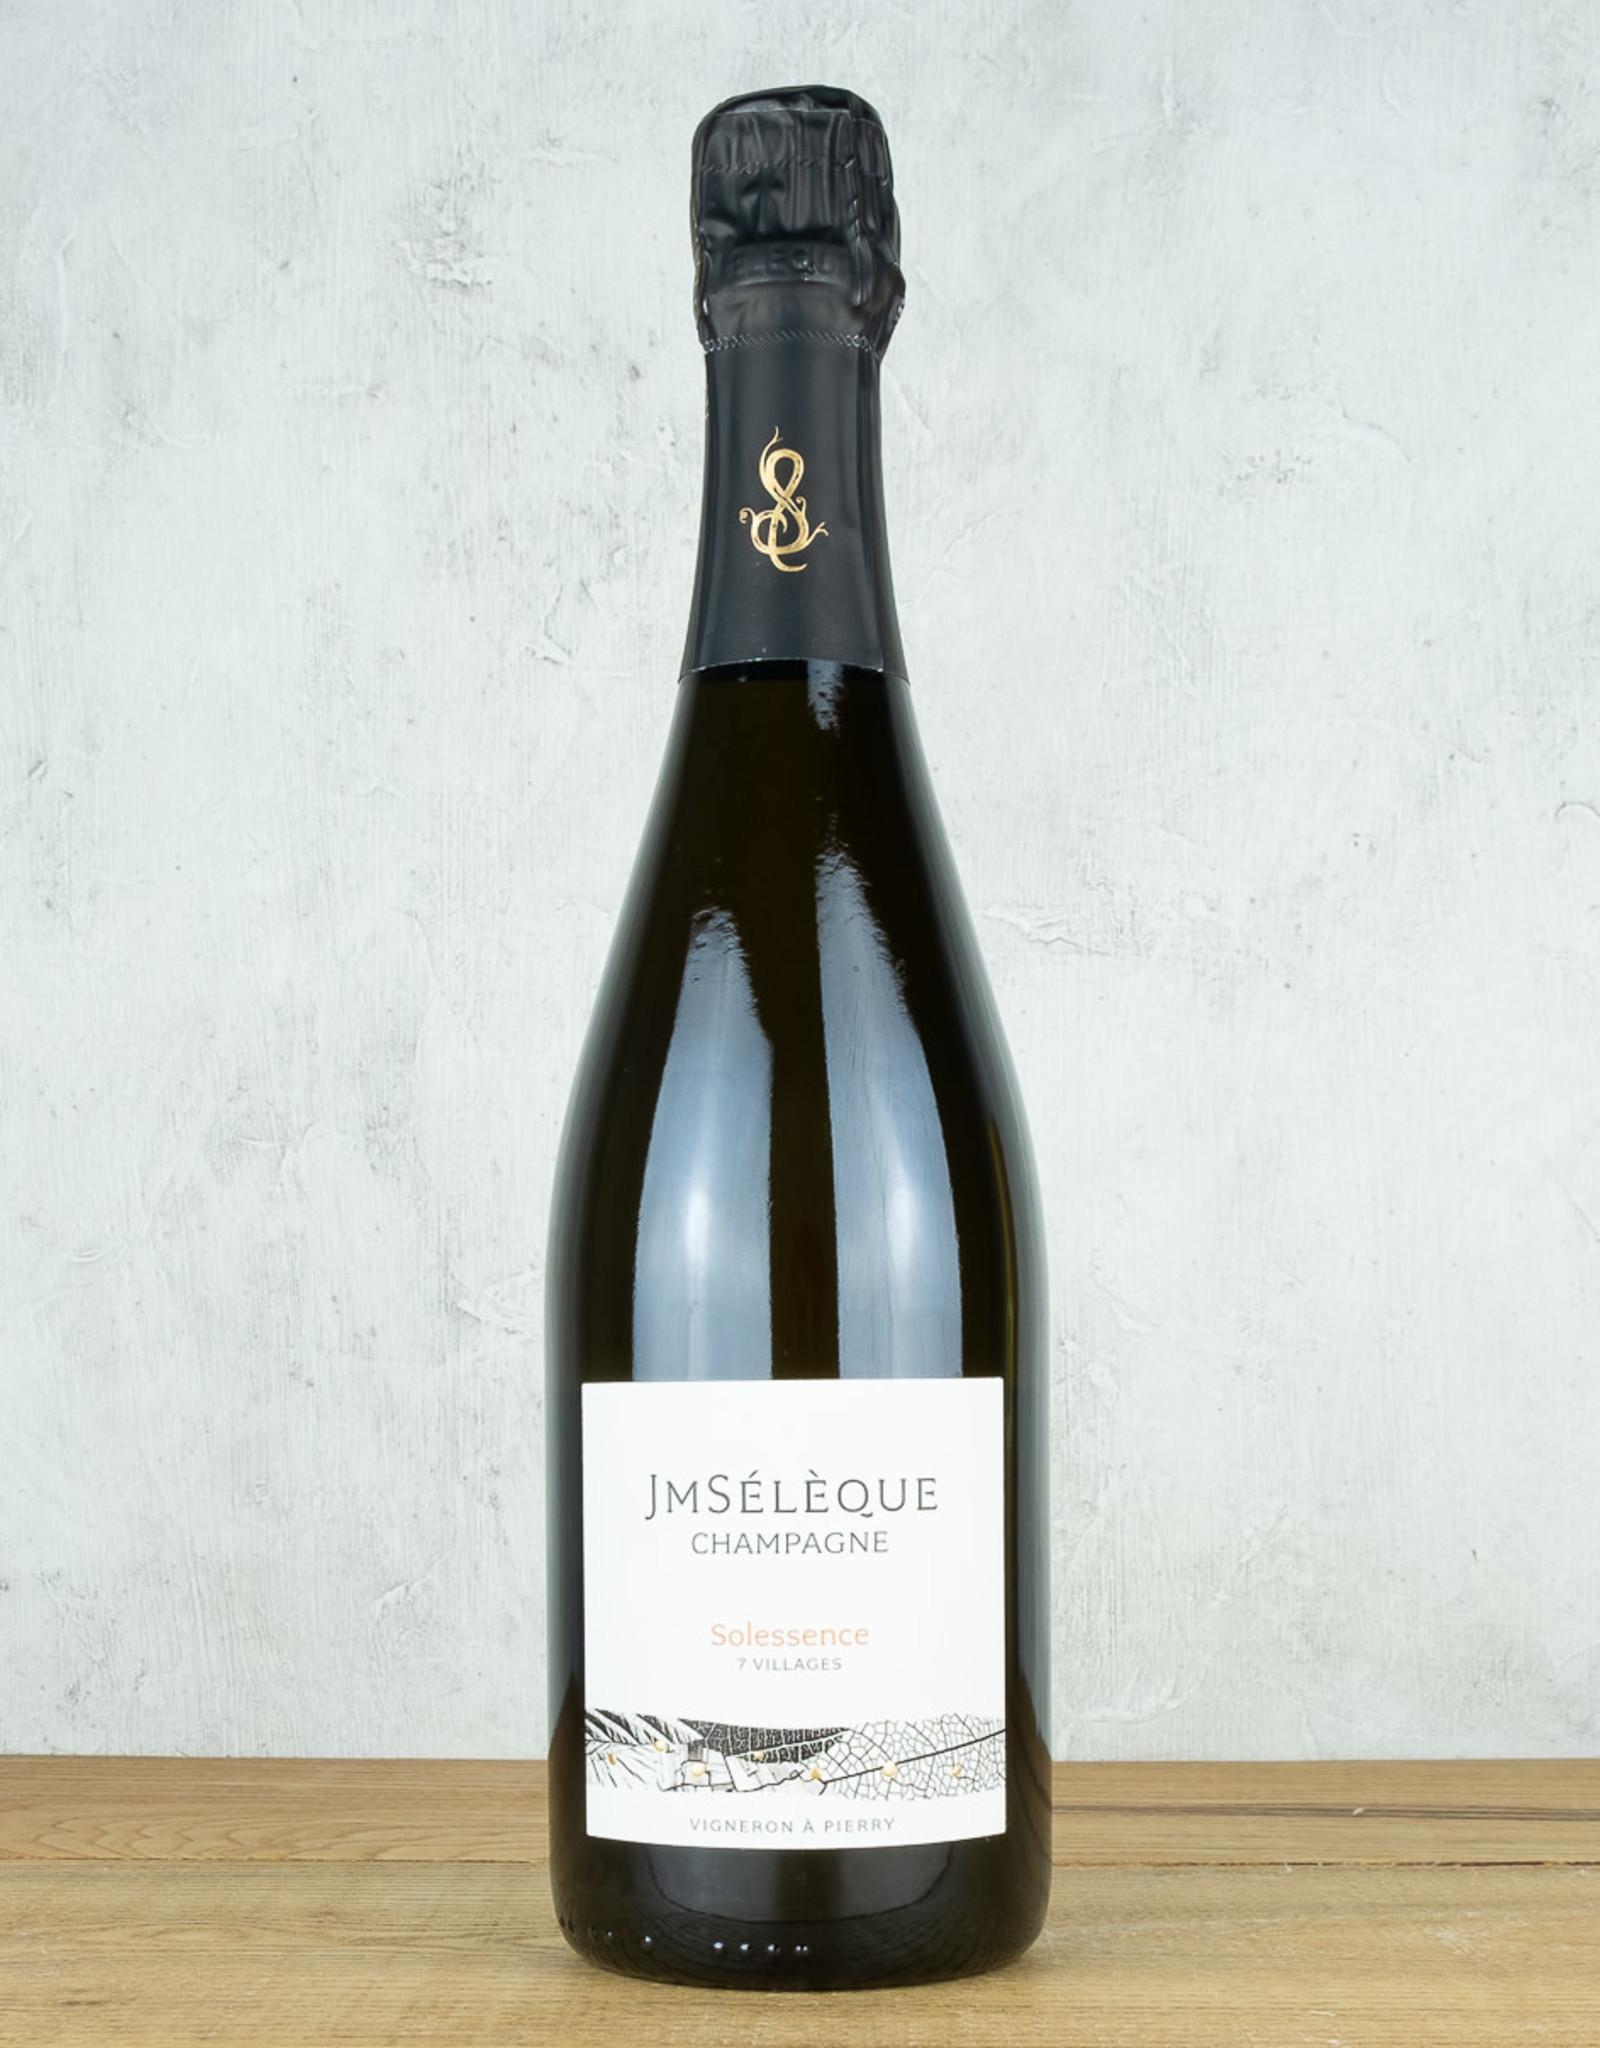 JM Seleque Solessence 7 Villages Extra Brut Champagne